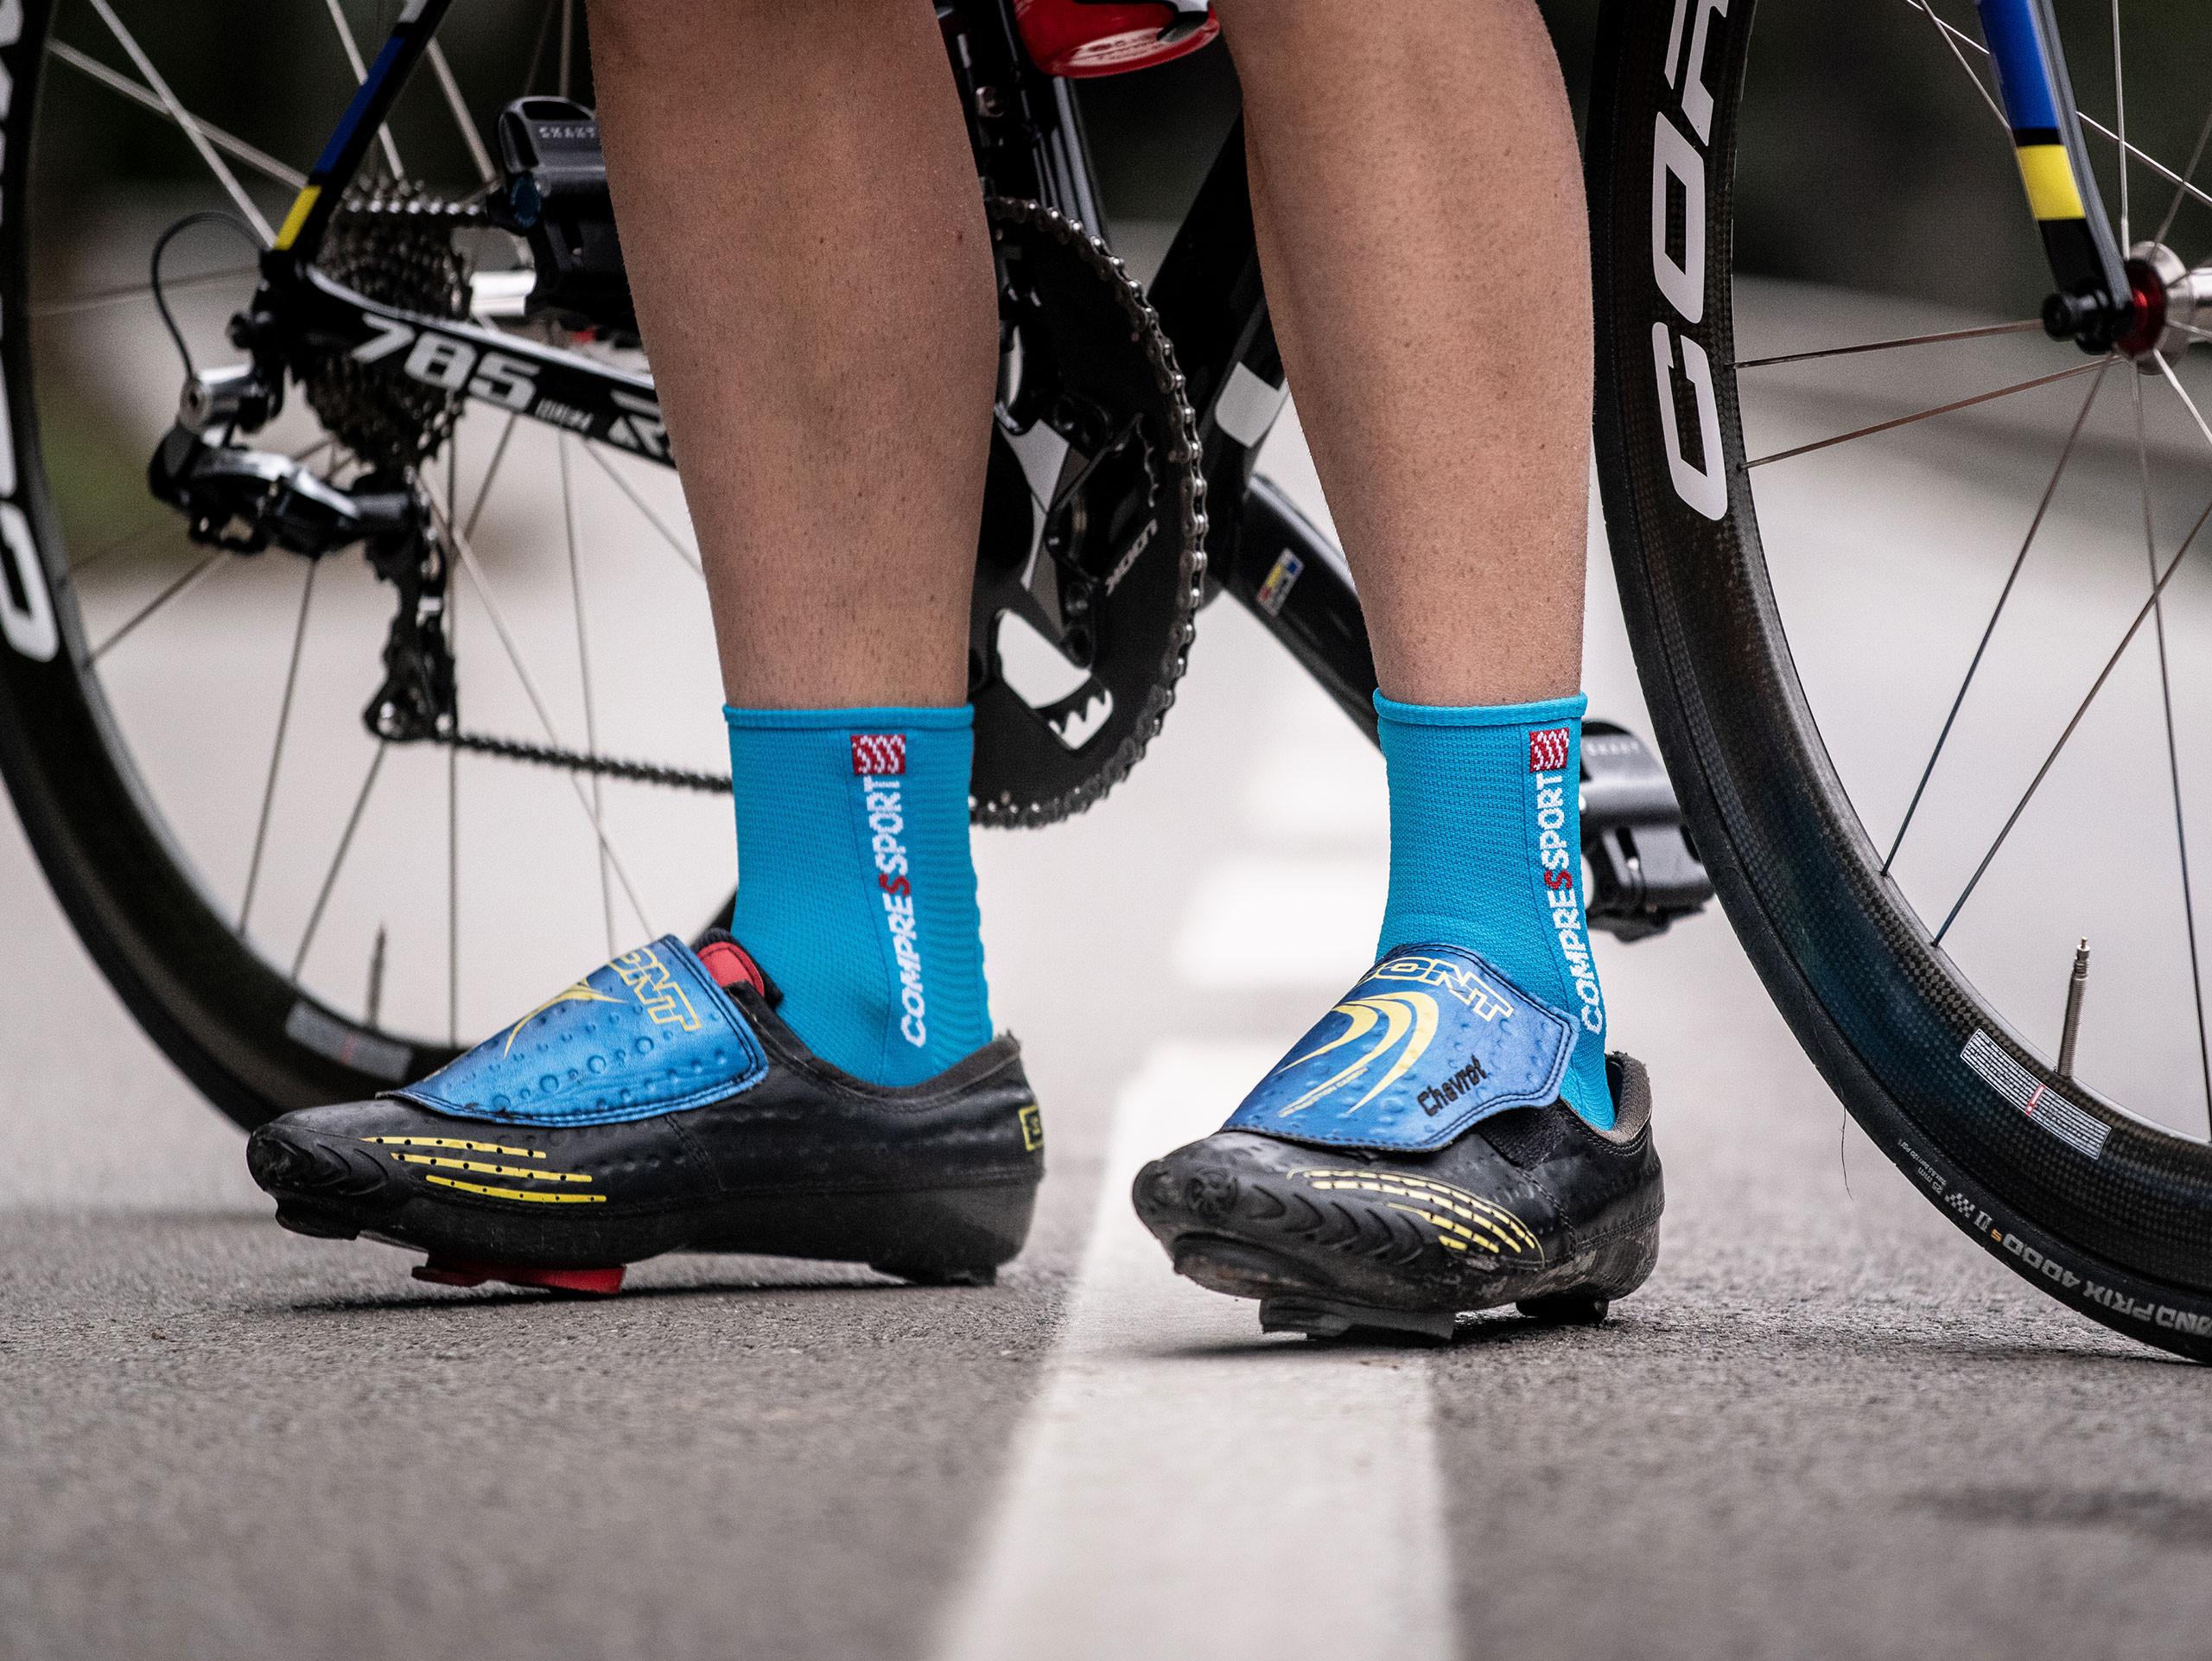 Pro Racing Socks v3.0 Bike ICE BLUE